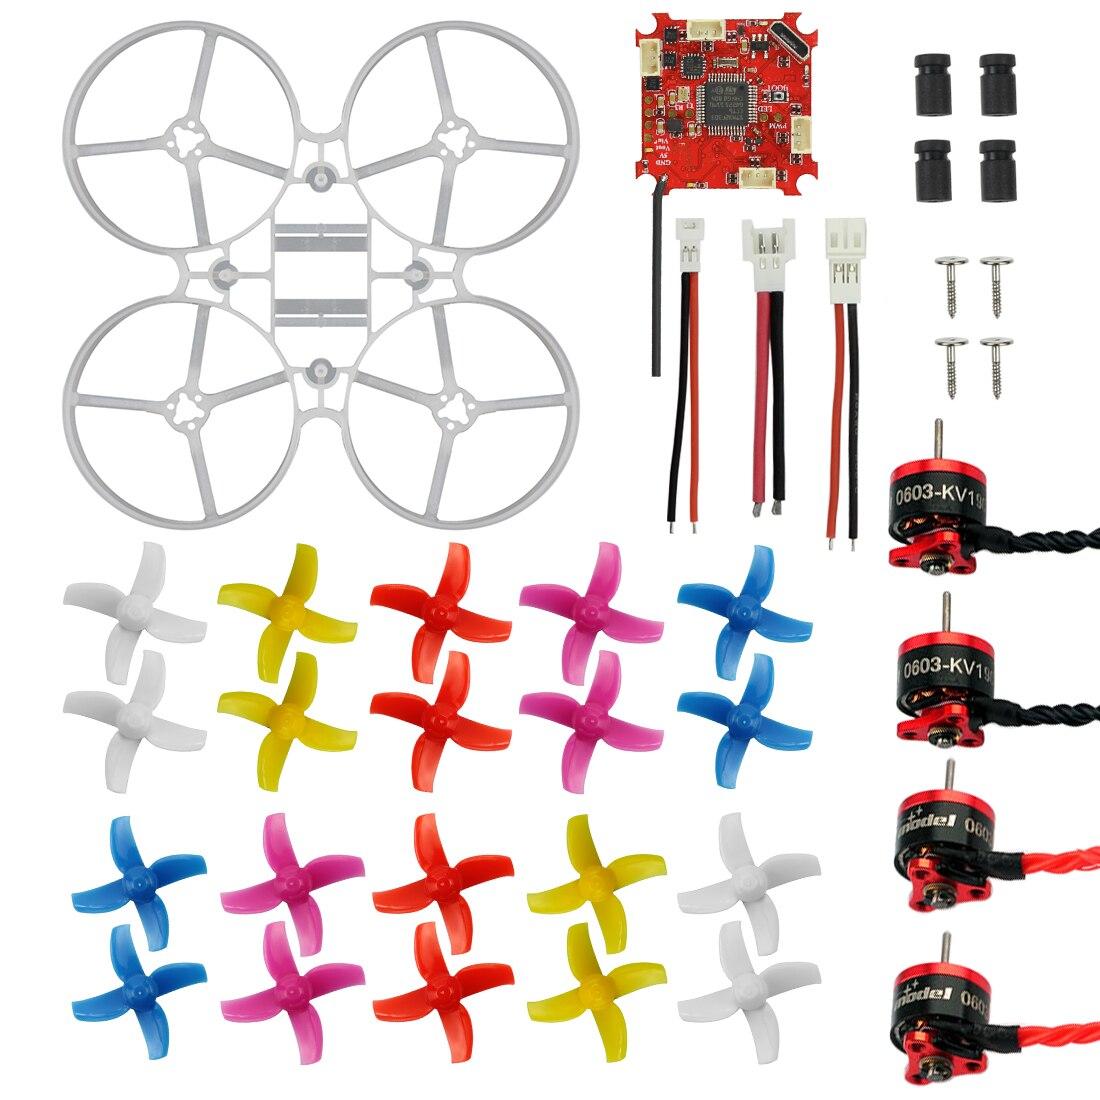 Mini Indoor 75mm RC Racing Drone Bwhoop75 Frame Kit & Crazybee F3 FC ESC & 1S KV19000 Motor & 40mm 4- Propeller